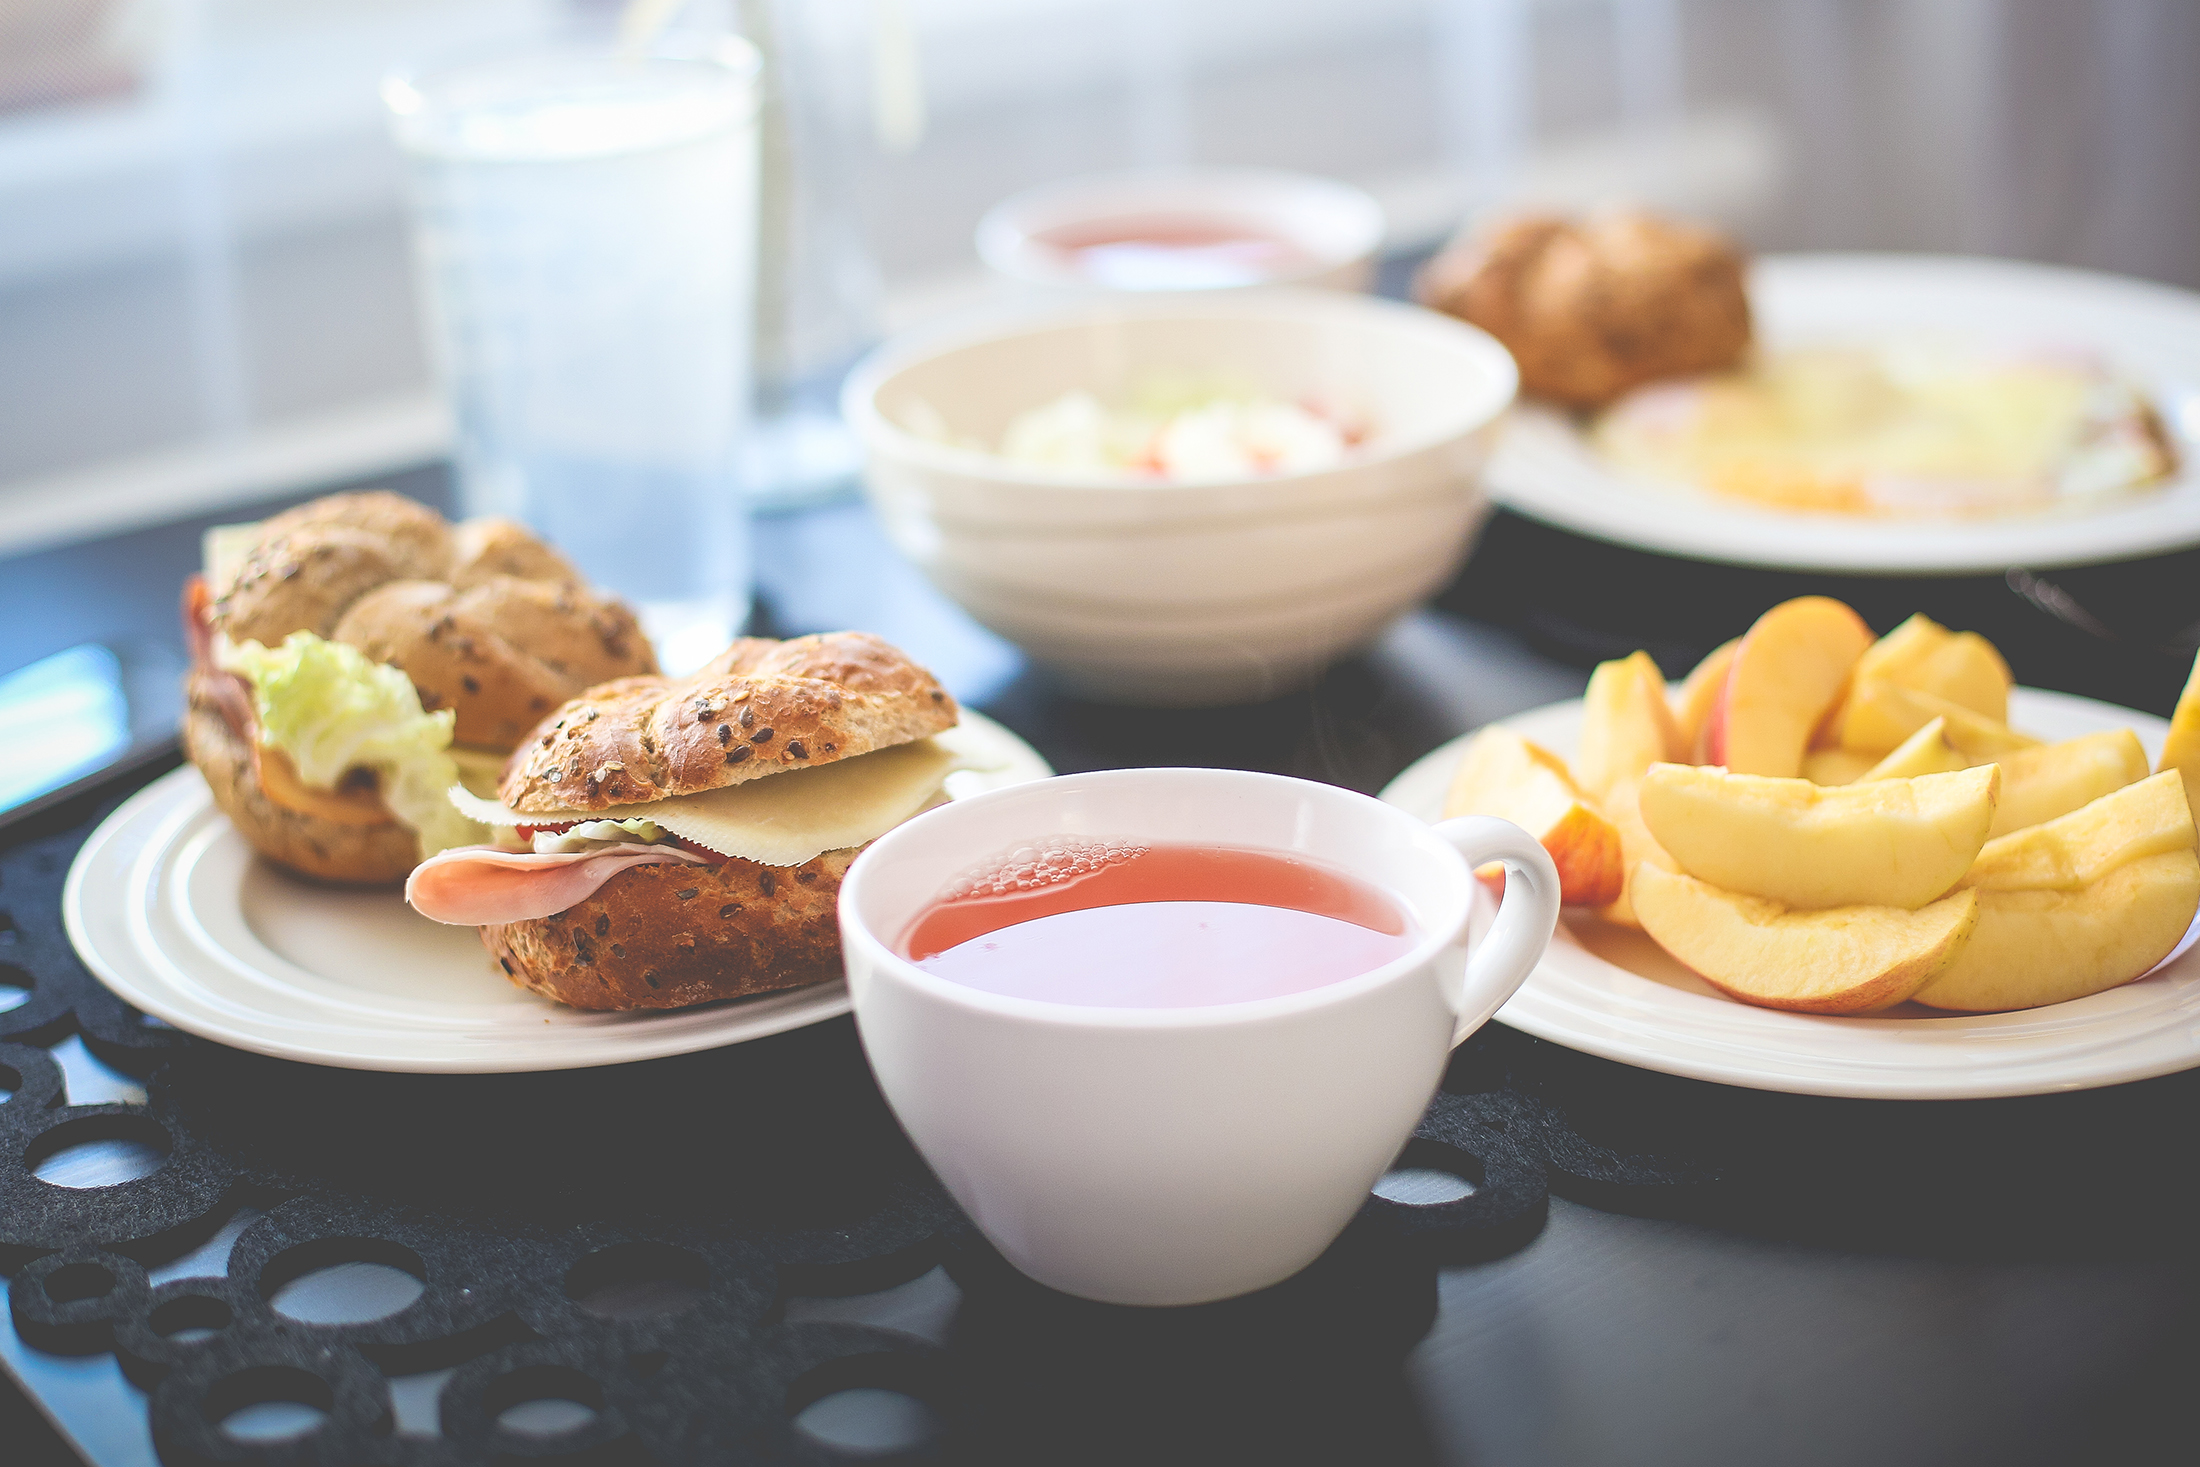 fresh-healthy-morning-breakfast-picjumbo-com